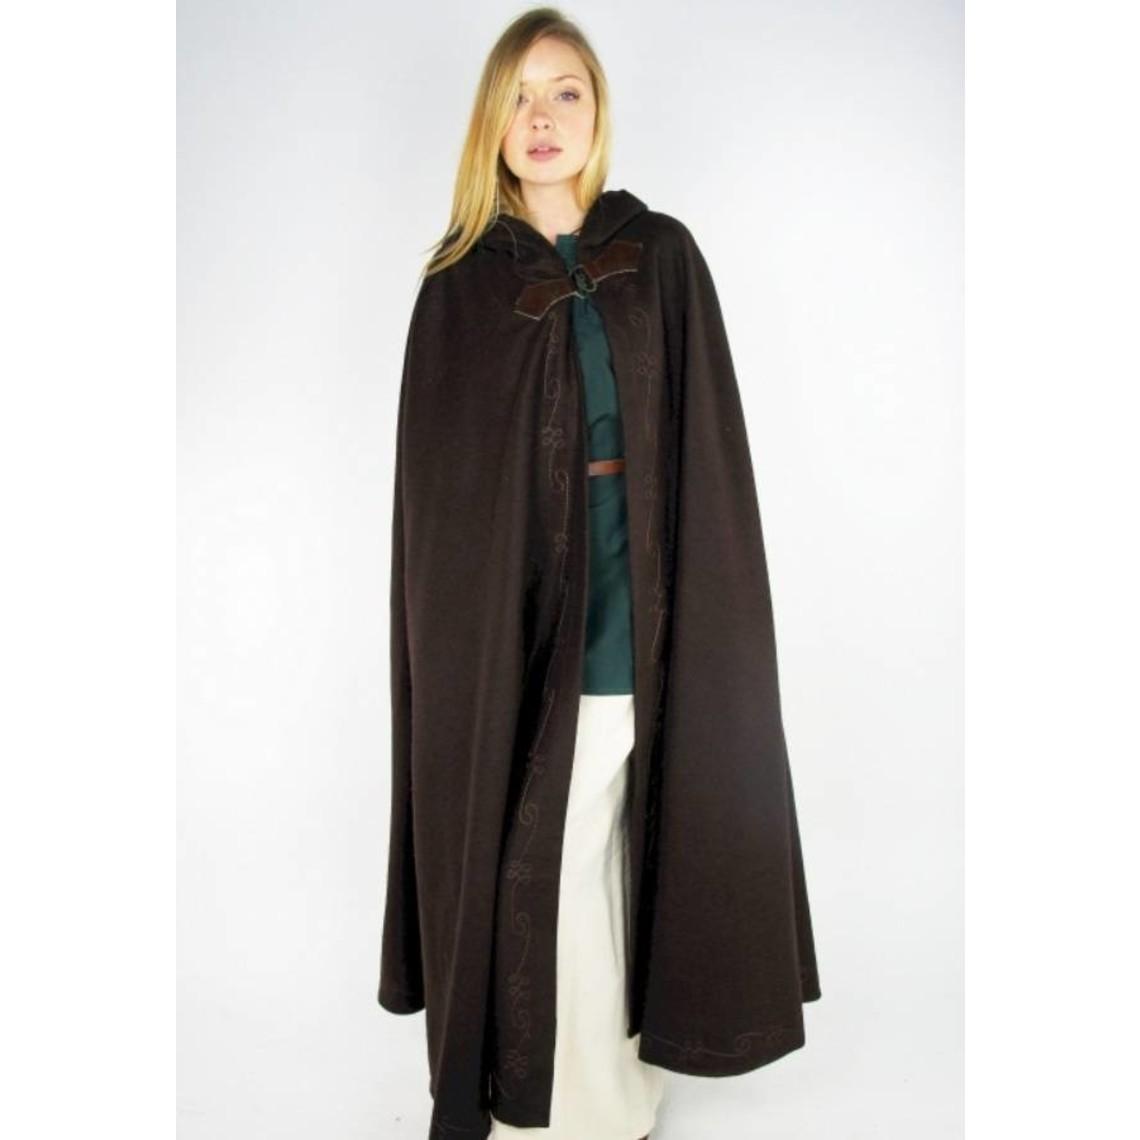 Leonardo Carbone Geborduurde mantel Damia met sluiting, zwart